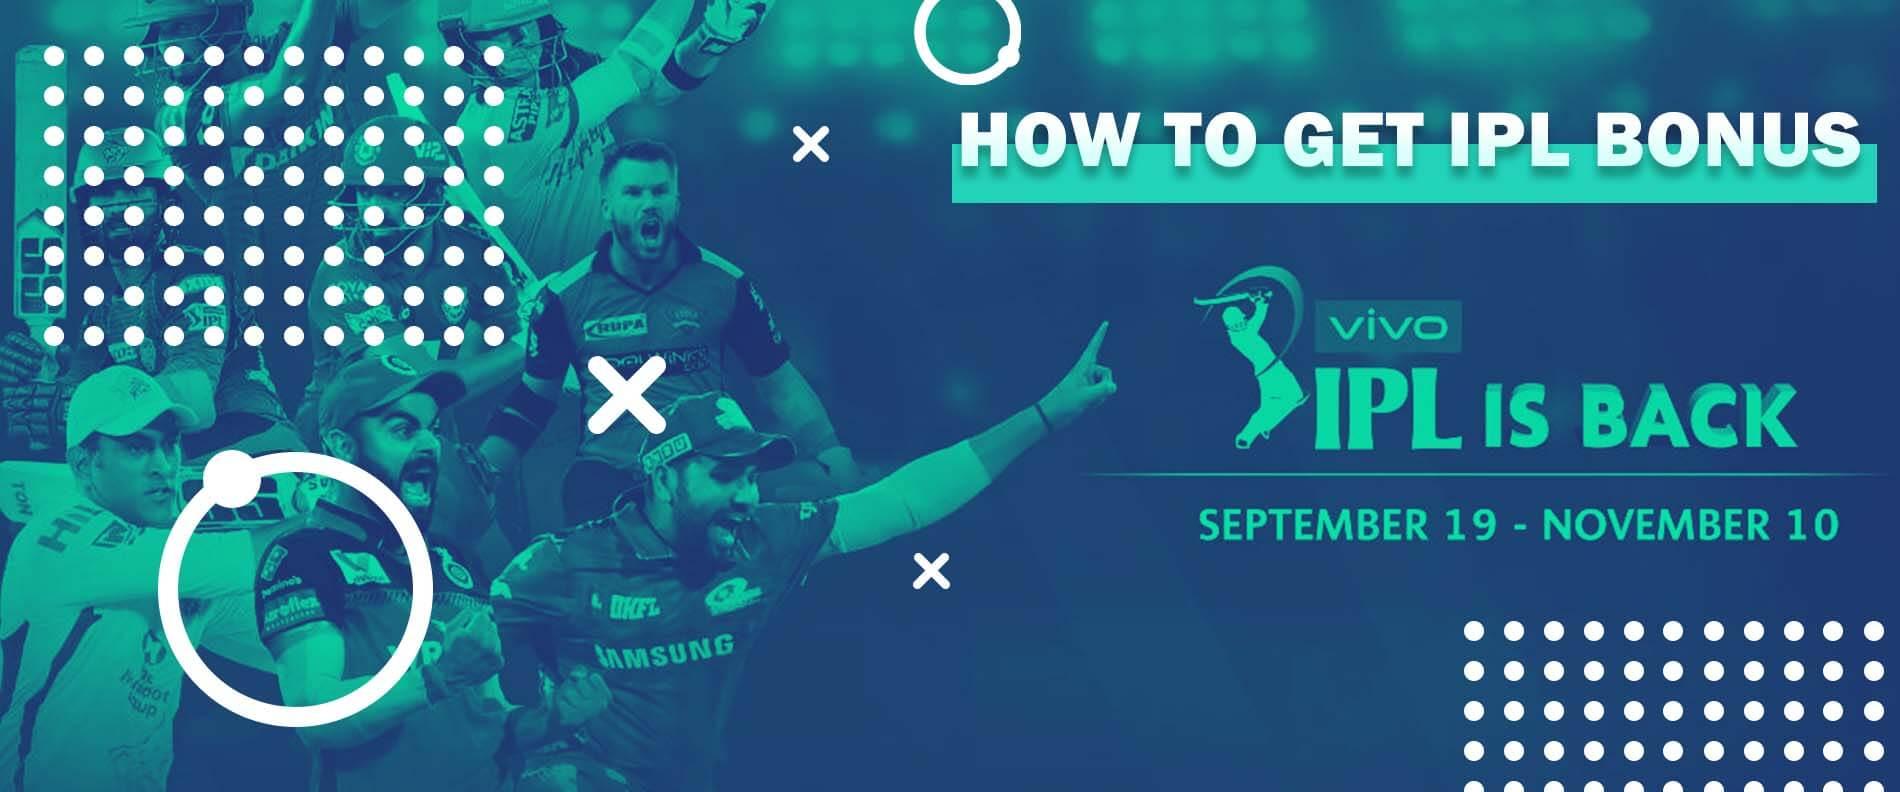 How to get the IPL Bonus.